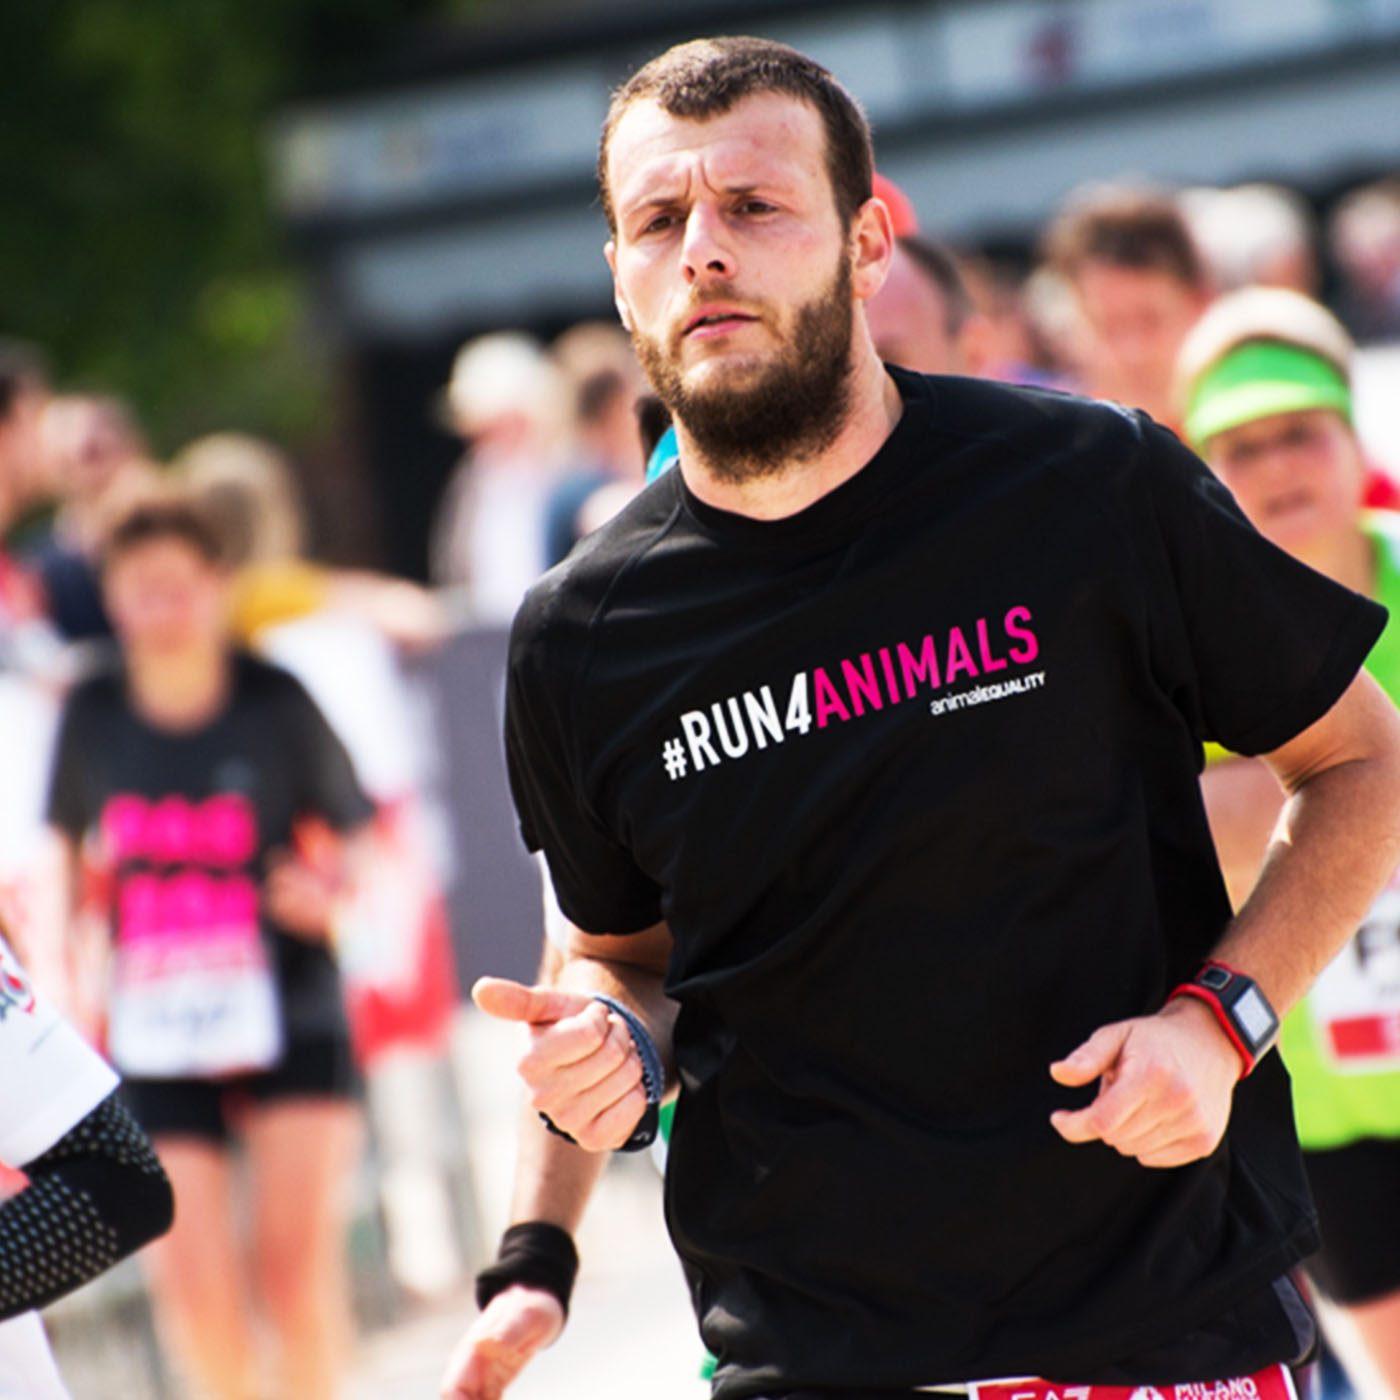 Milano Marathon corri animali